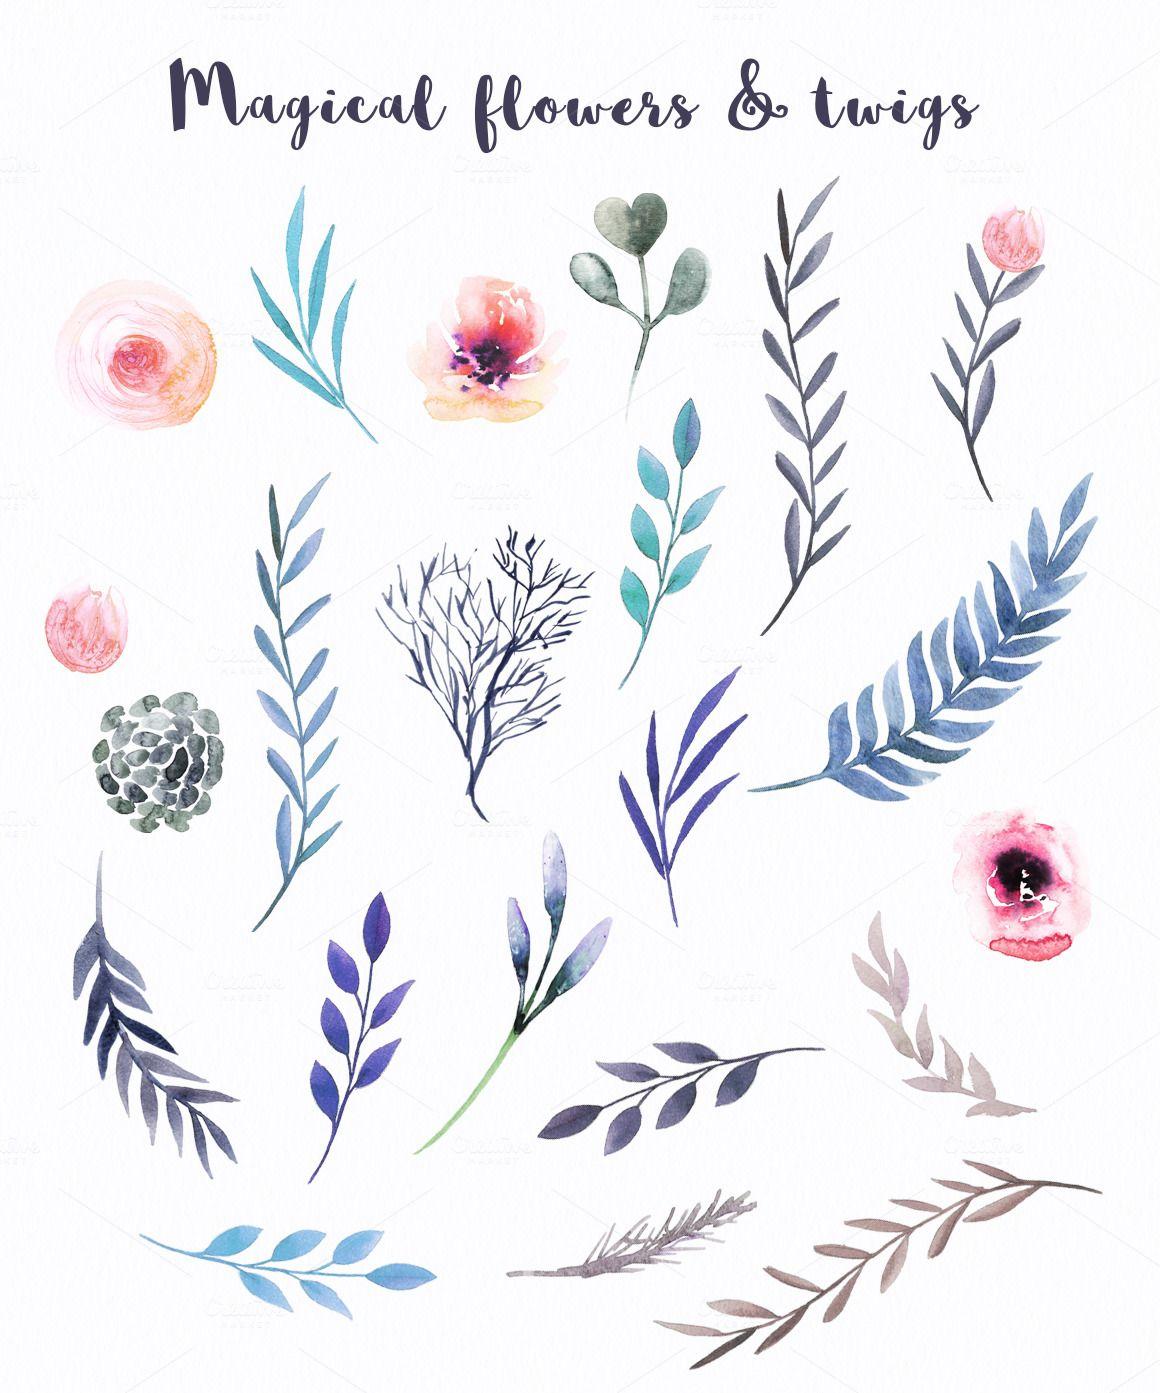 Watercolor Magic Flowers by Spasibenko Art on @creativemarket